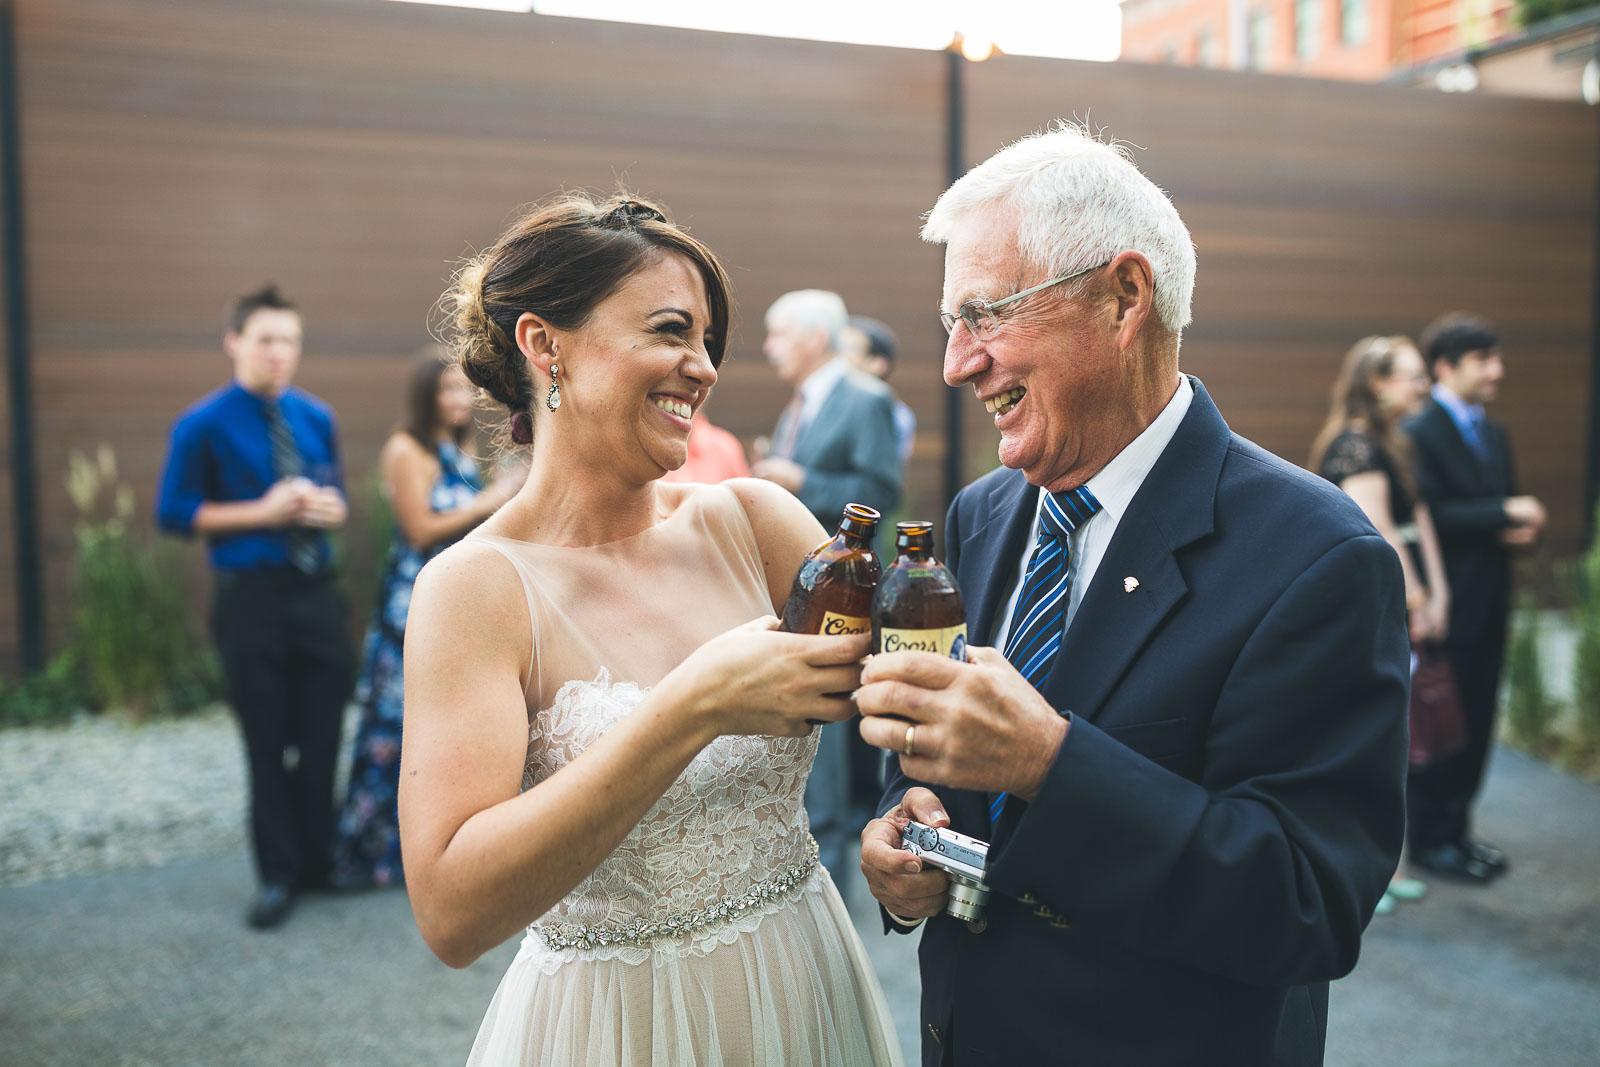 Cheers with Grandpa